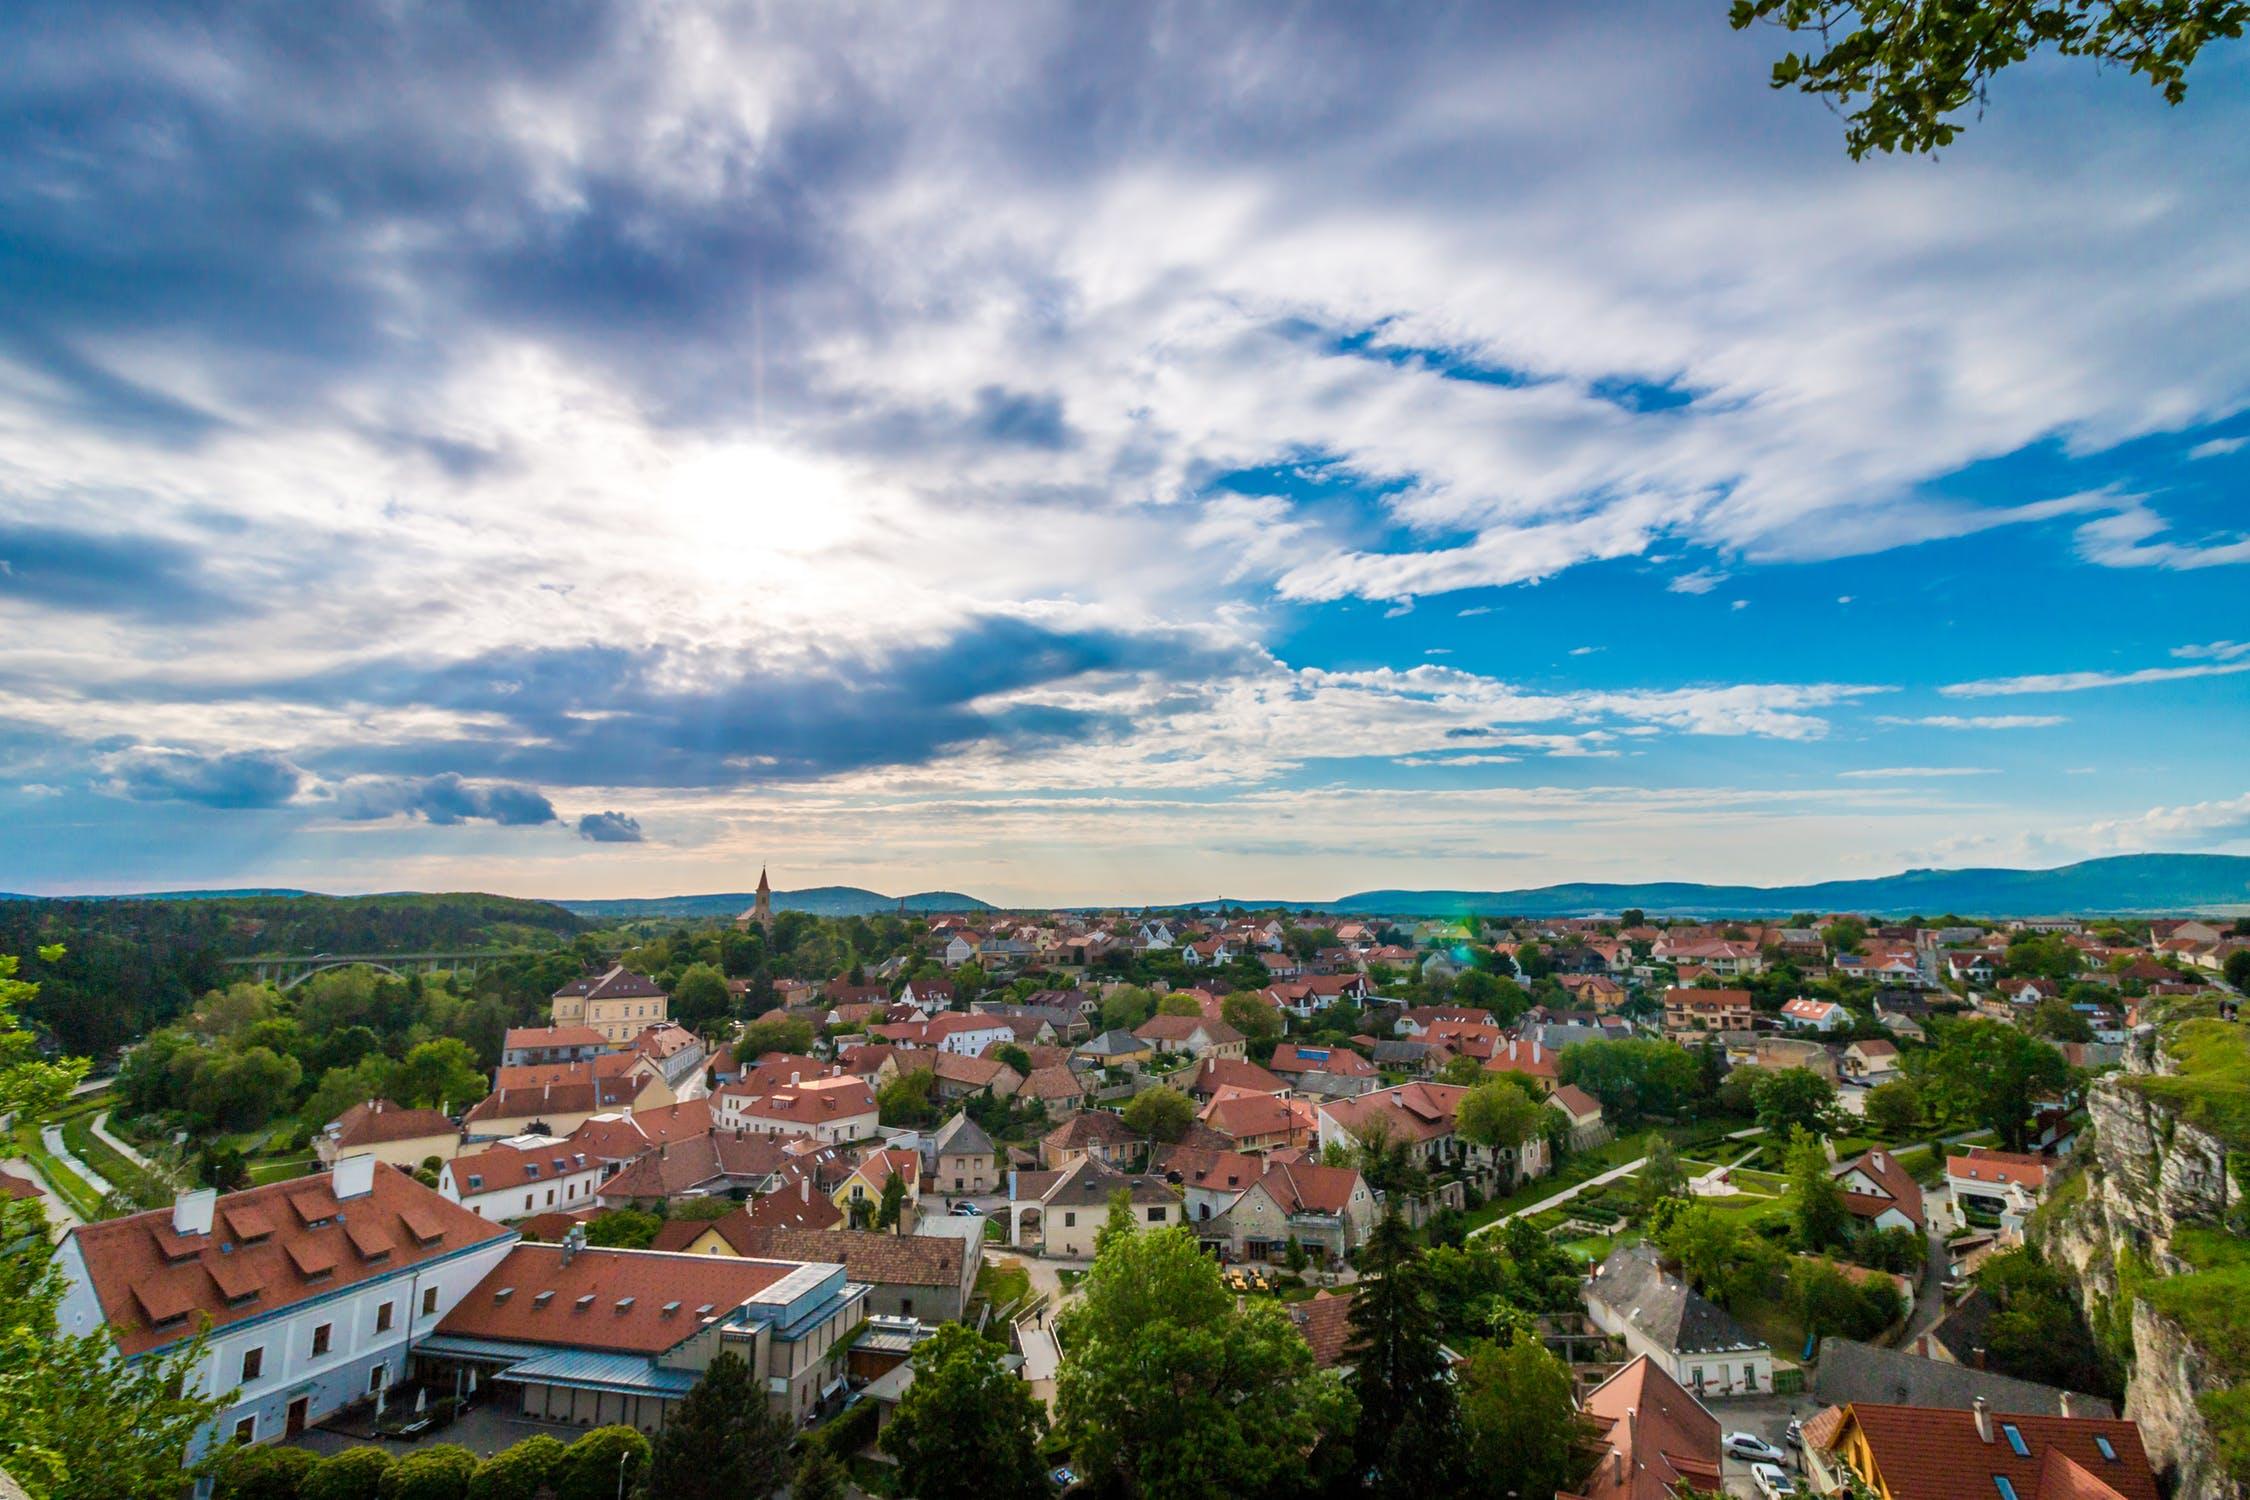 EFFICIENZA ENERGETICA: ASSEGNATI OLTRE 500 MILIONI DI EURO AI COMUNI